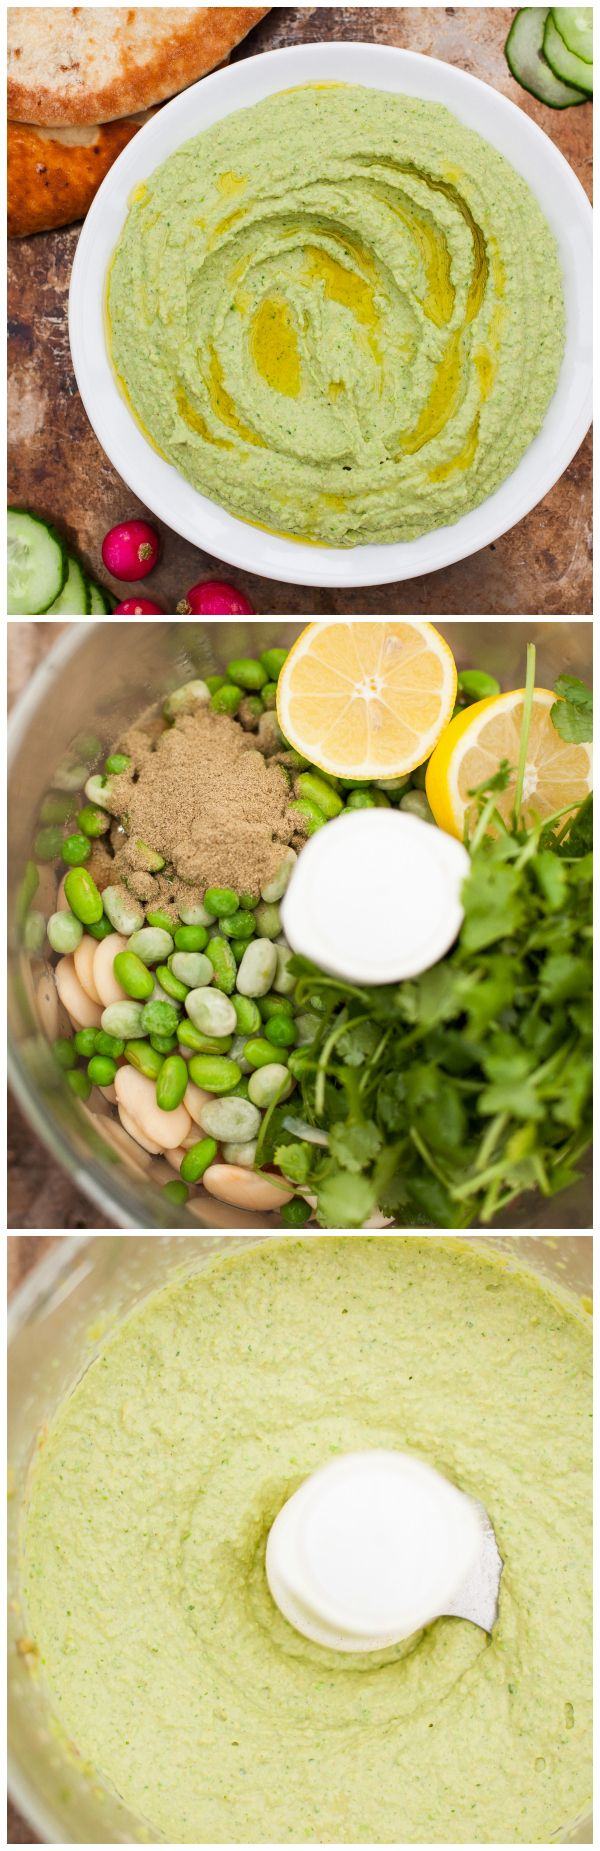 #Recipe: Lemony Edamame and Butter Bean #Hummus